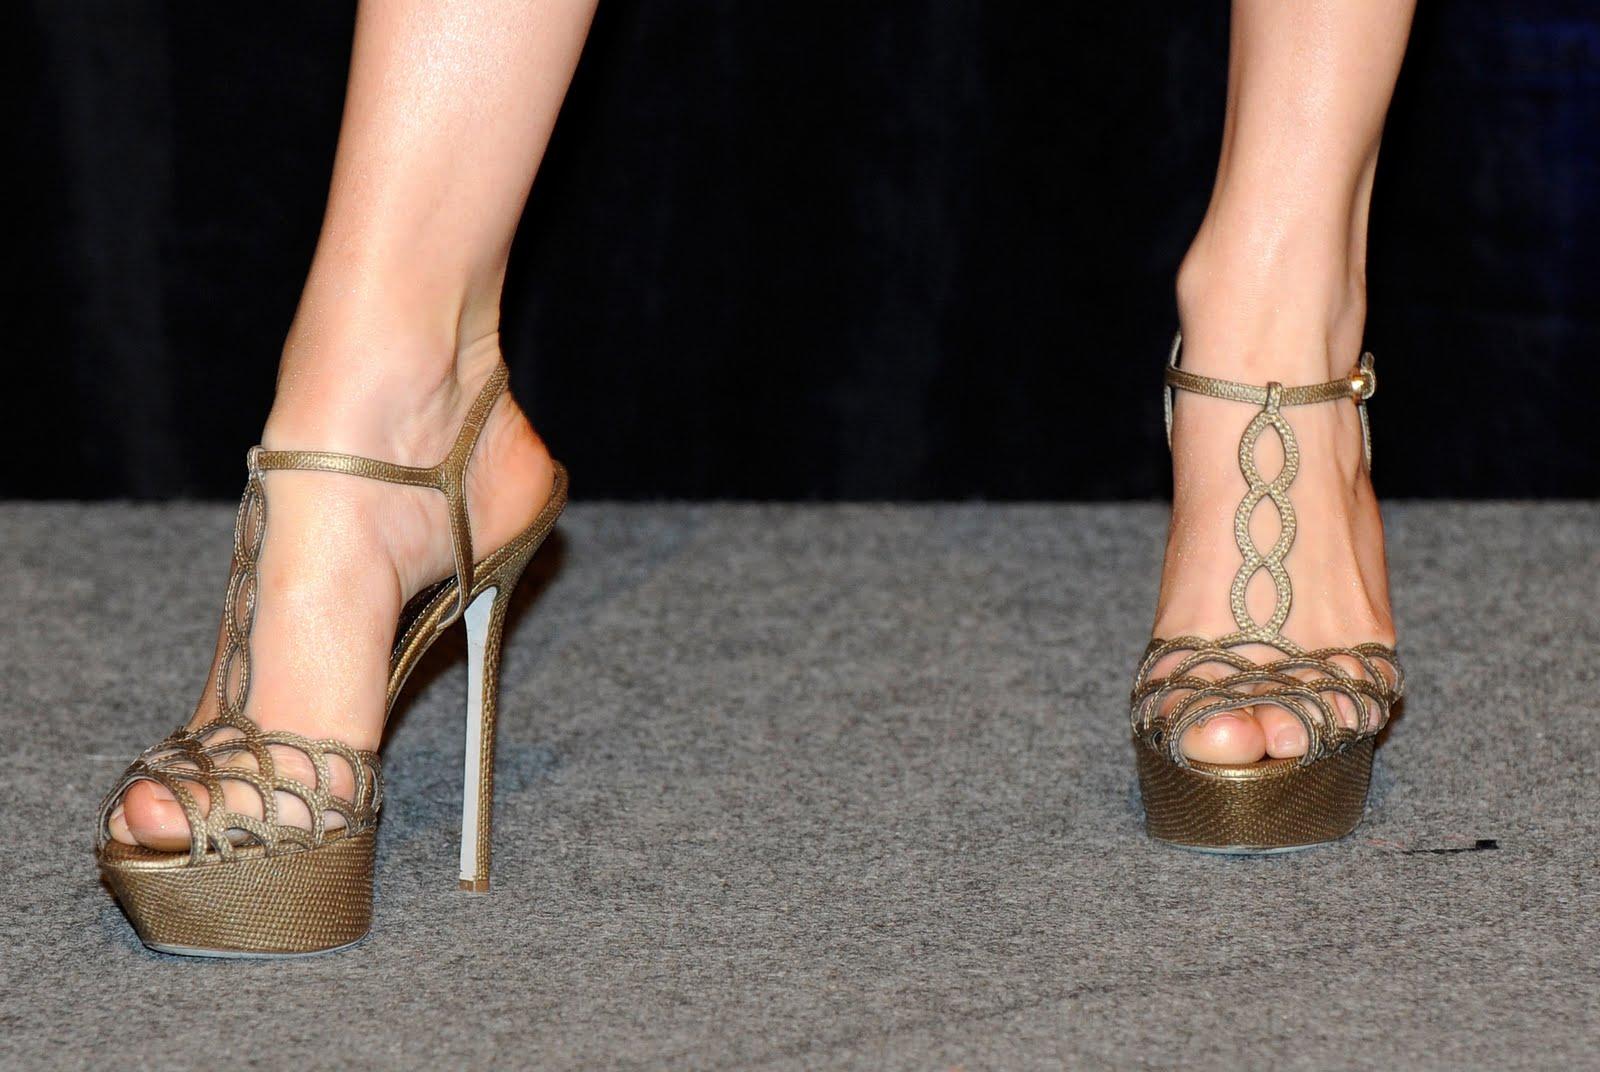 http://4.bp.blogspot.com/_bQ0SqifjNcg/S7Oh4iDshLI/AAAAAAAATEE/RGO1ygfbTks/s1600/jennifer-lopez-feet-5.jpg